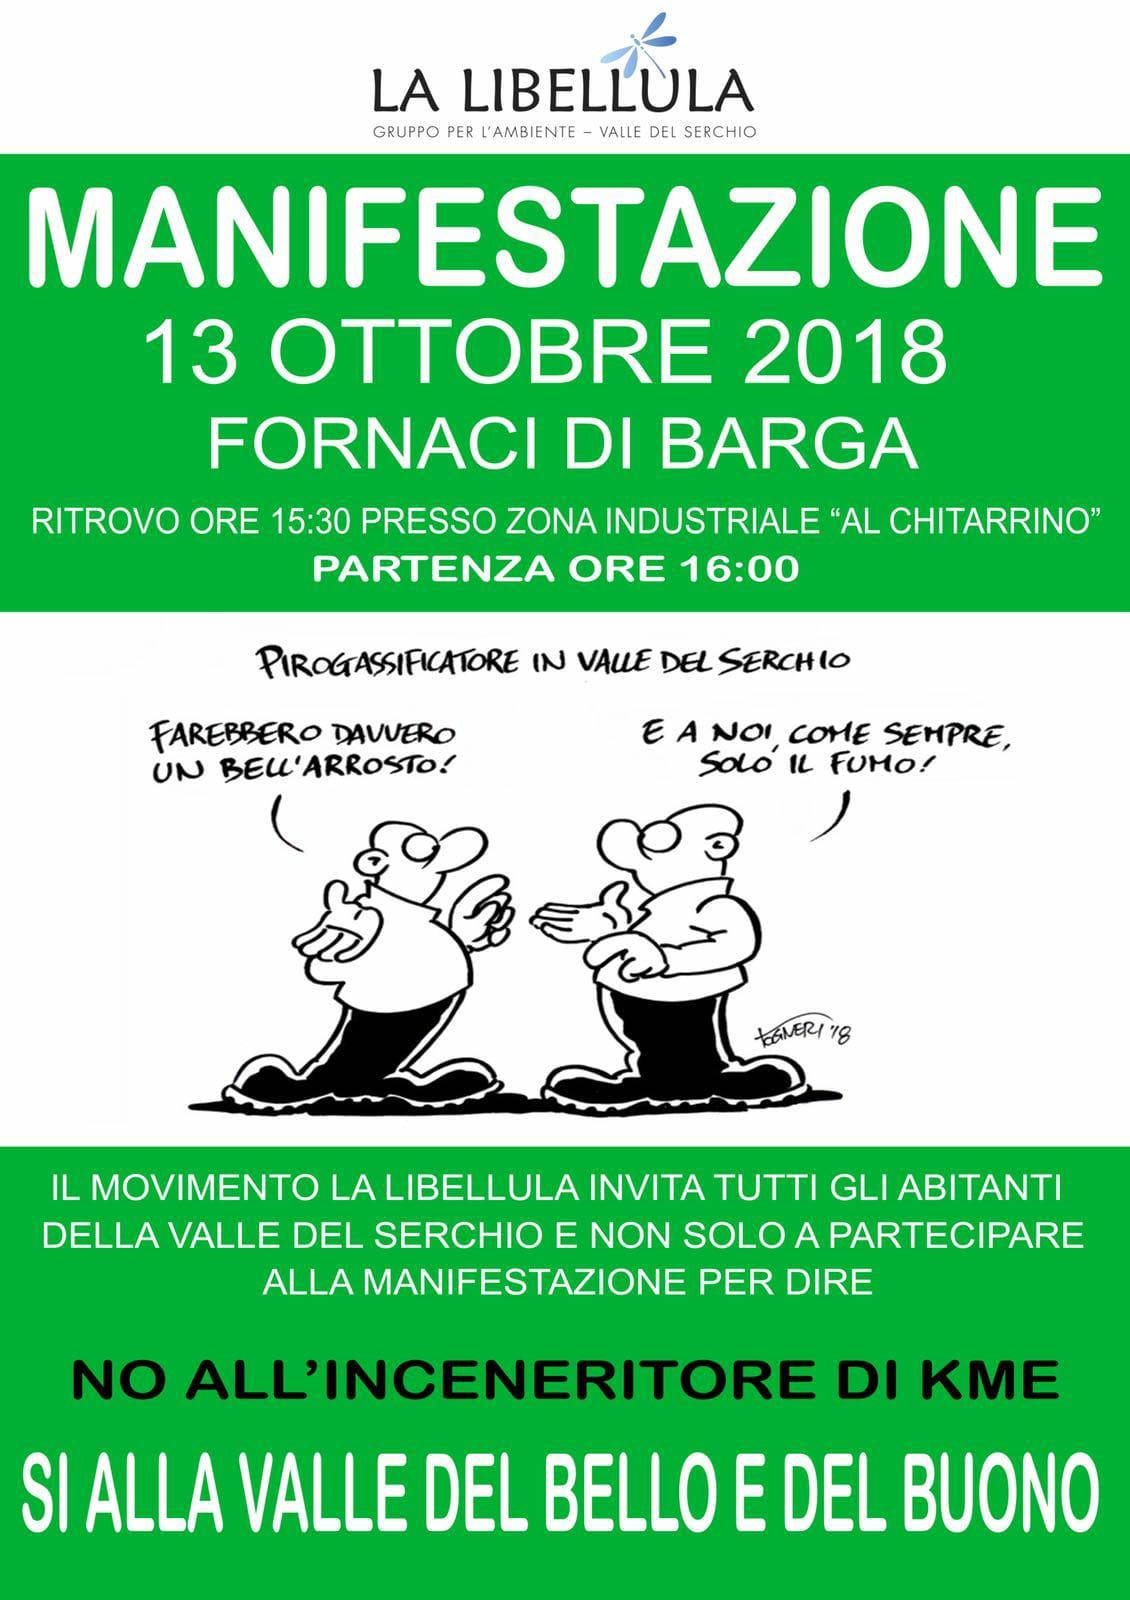 http://www.movimentolalibellula.com/wp-content/uploads/2018/09/20181013_manifestazione_locandina.jpg